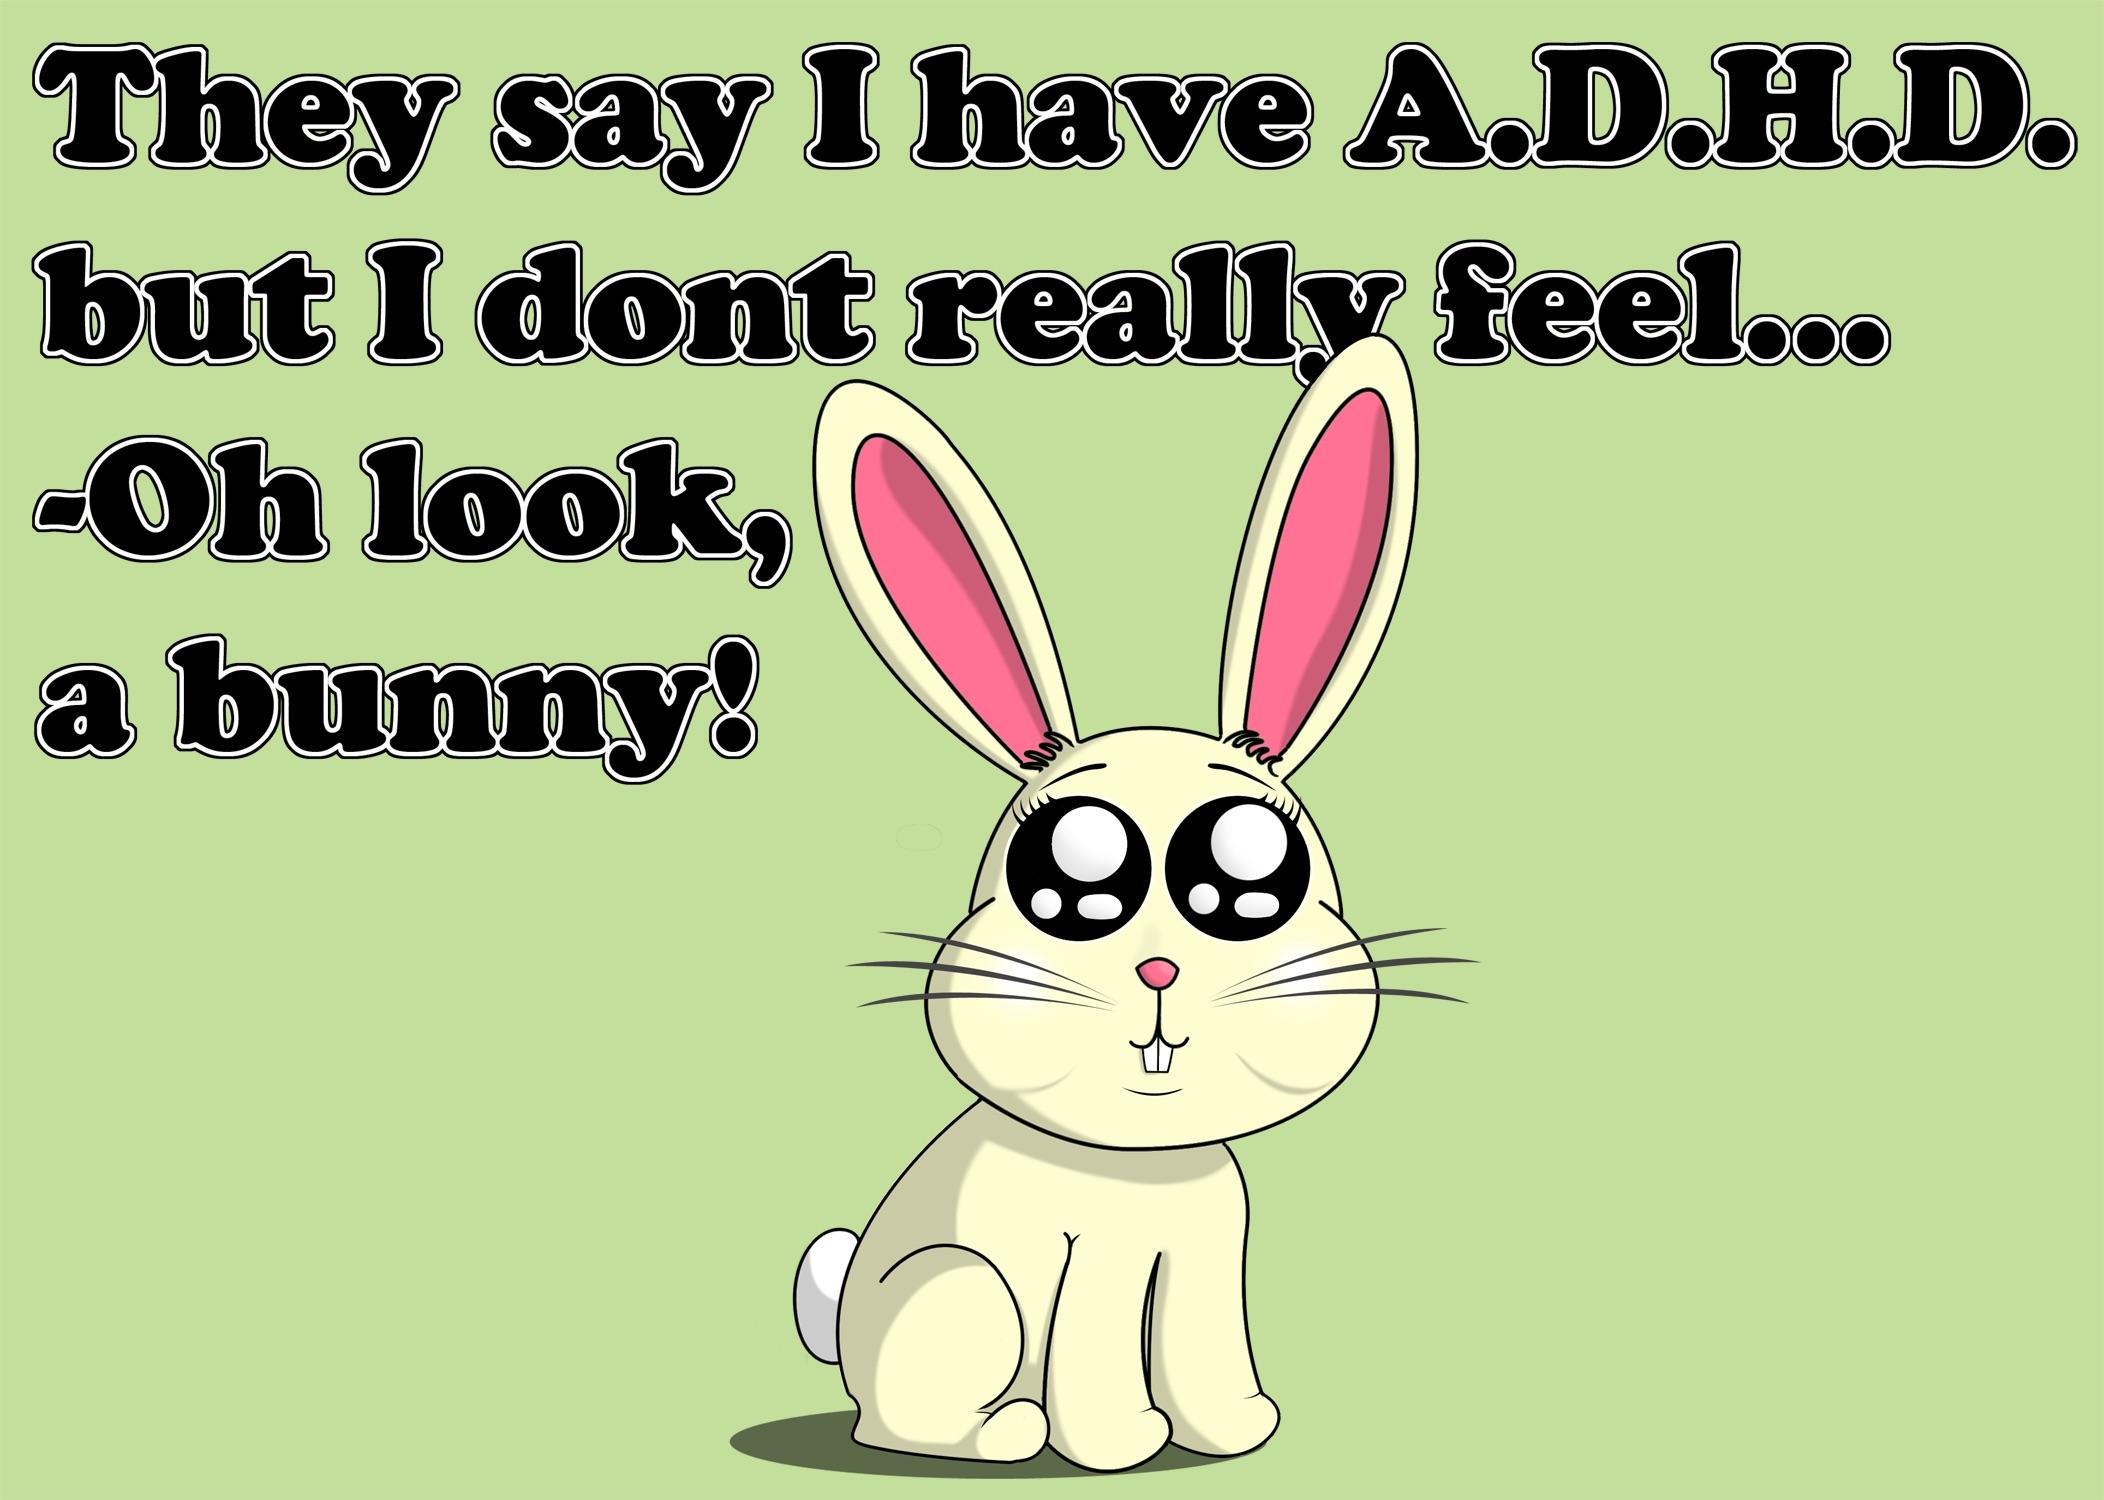 216776_tomsan_adhd-bunny